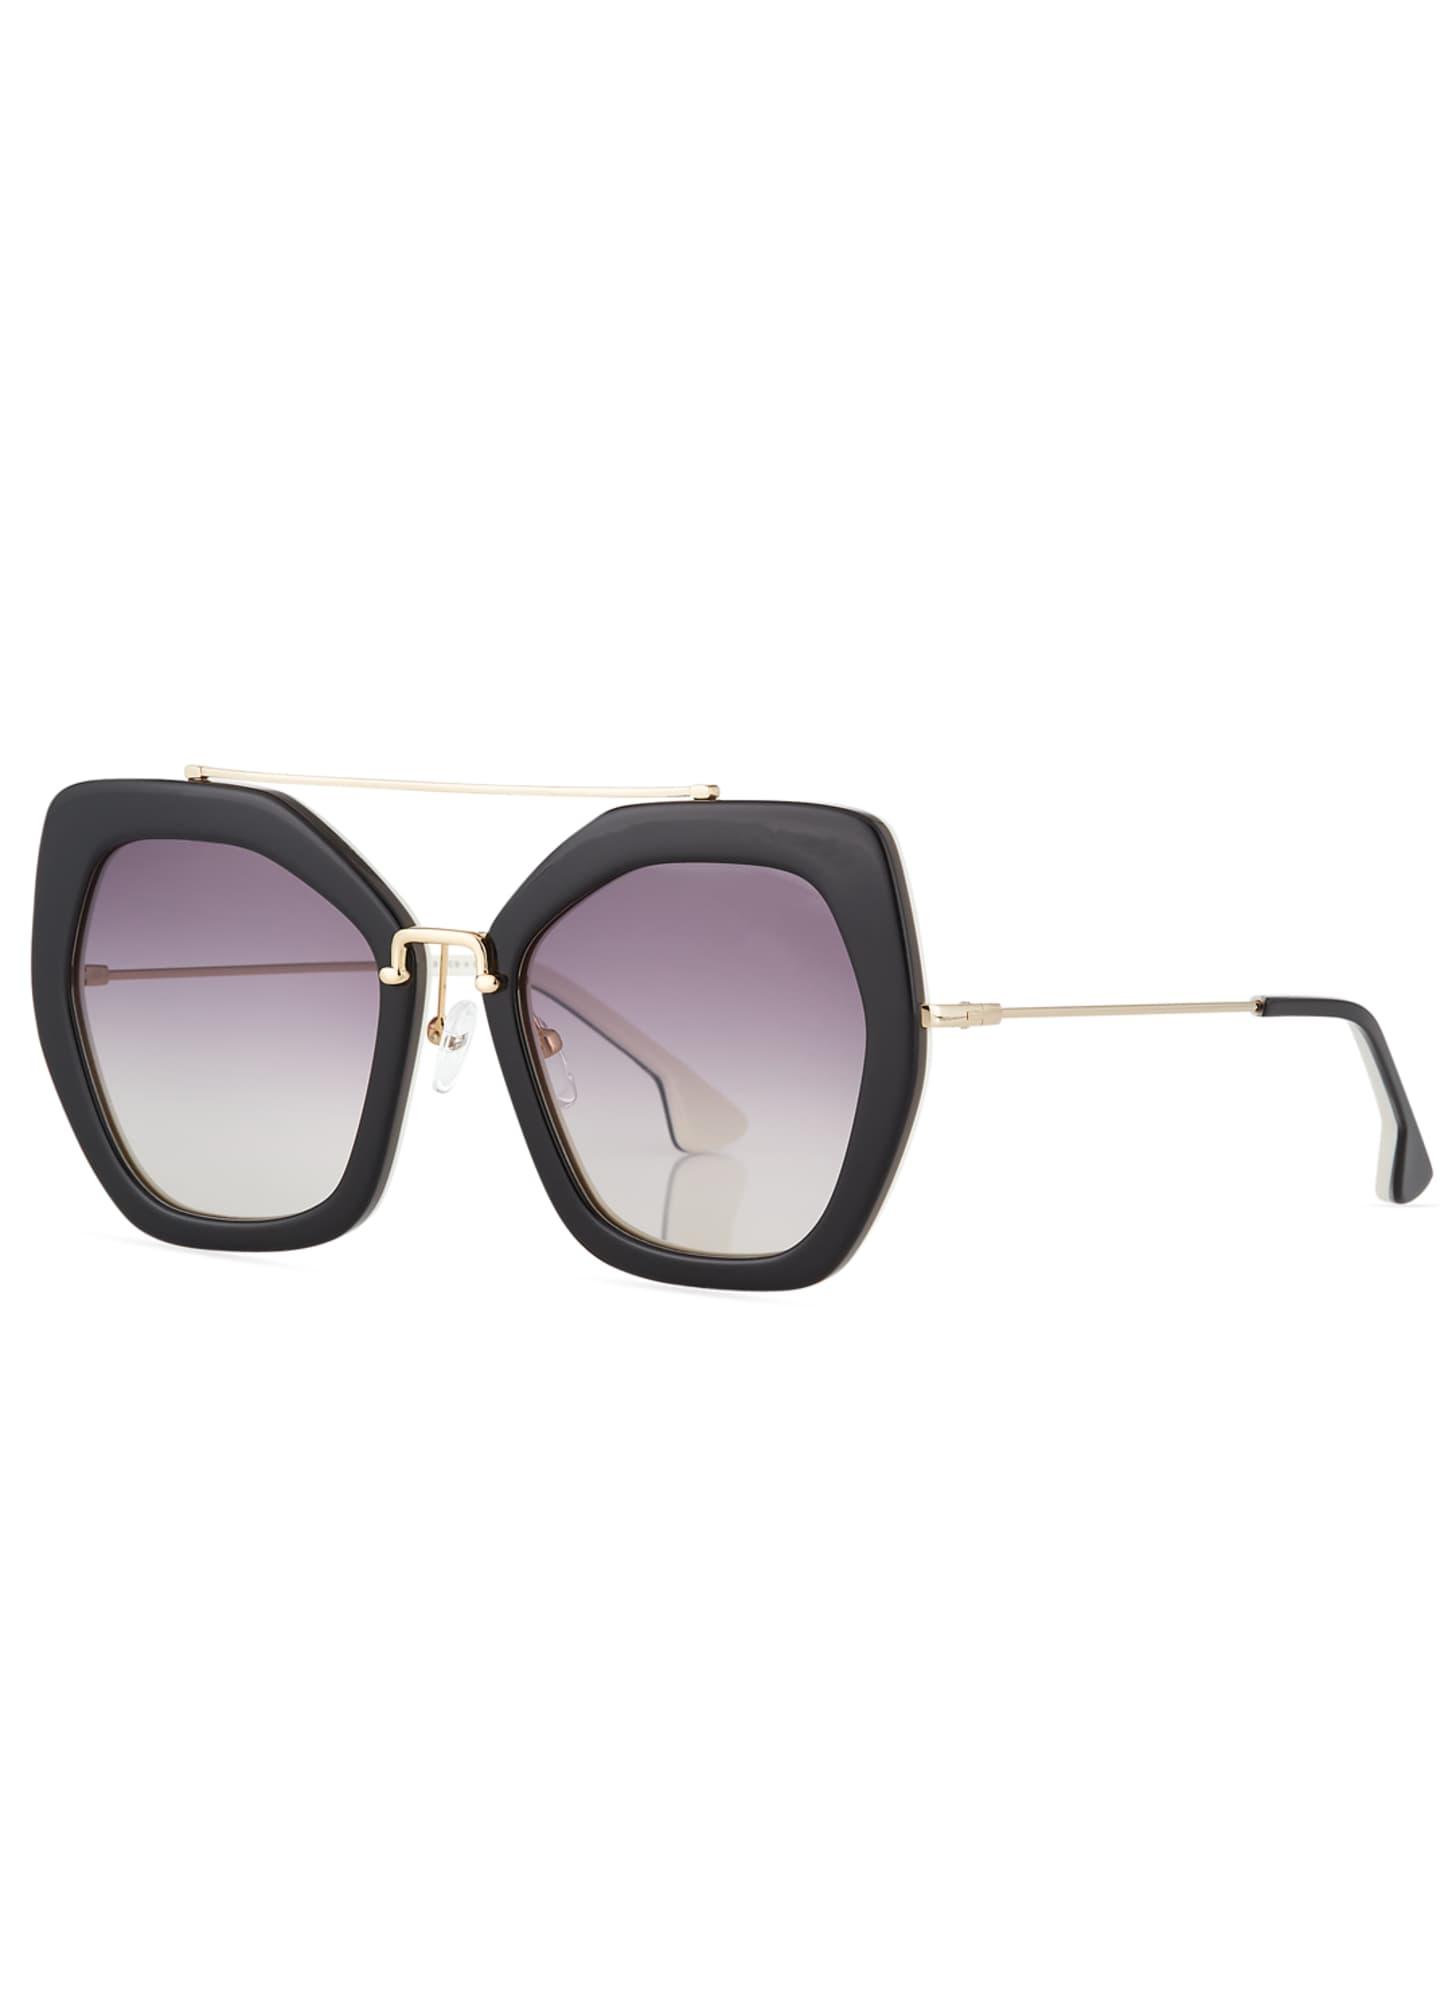 Alice + Olivia Bowery Square Sunglasses, Black